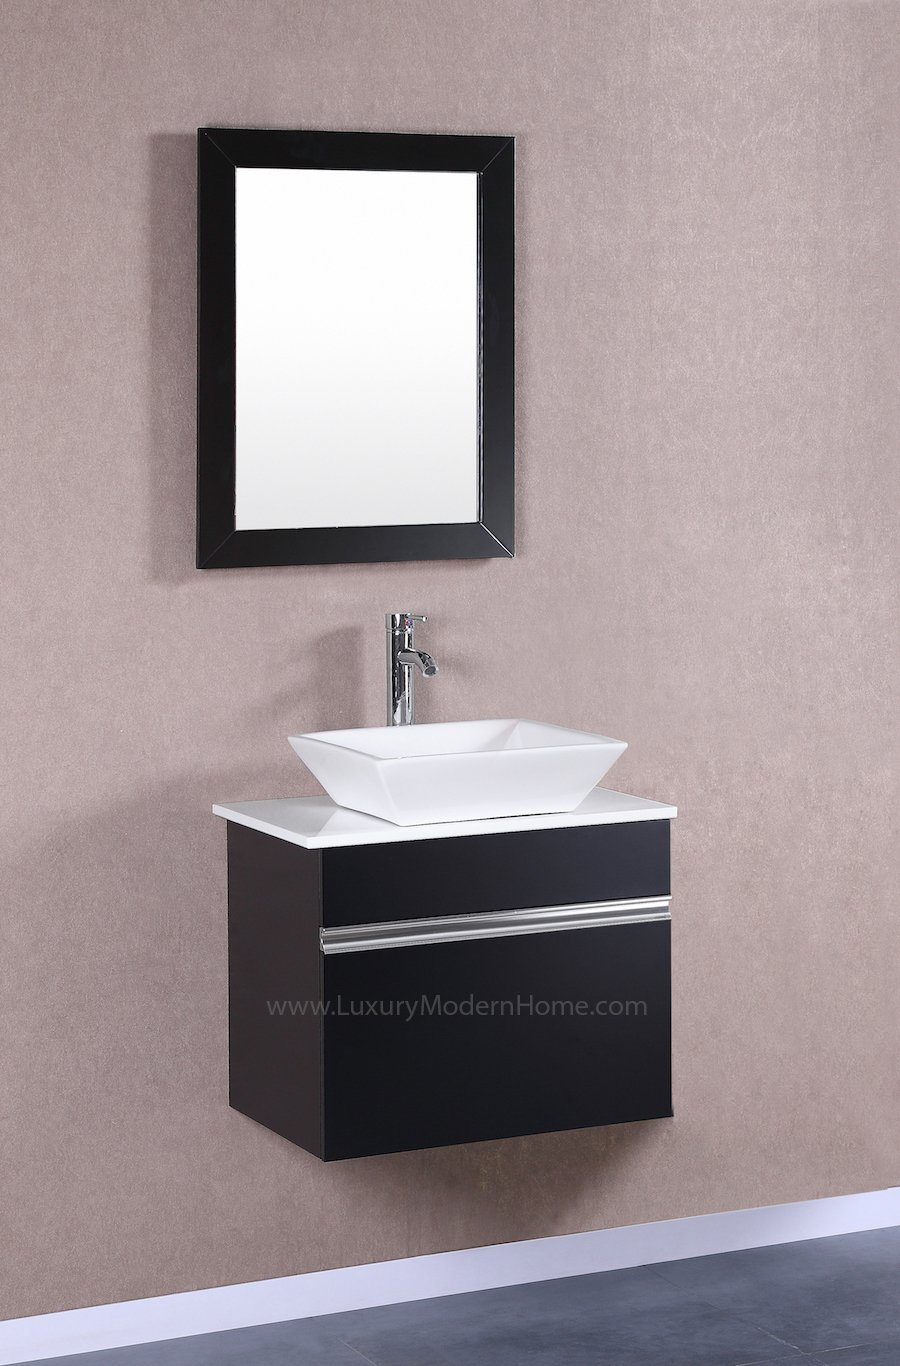 MARCUS - 24'' Small BLACK Modular Wall Mount Vessel Hung Floating Modern Bathroom Vanity Sink